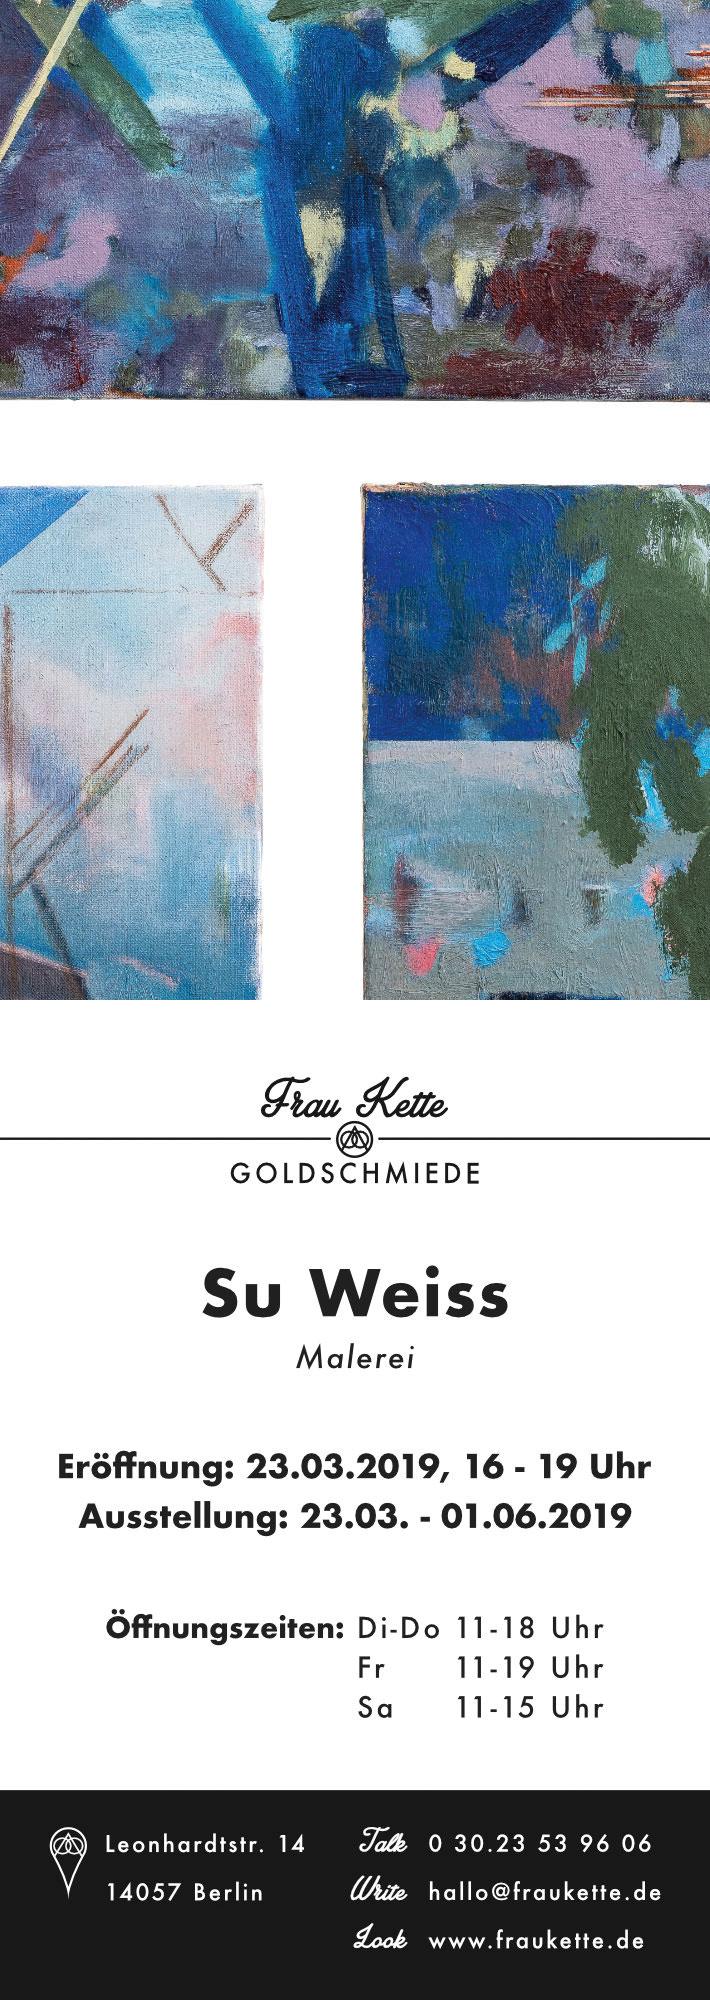 Ausstellungseröffnung 23.03.2019 bei Frau Kette